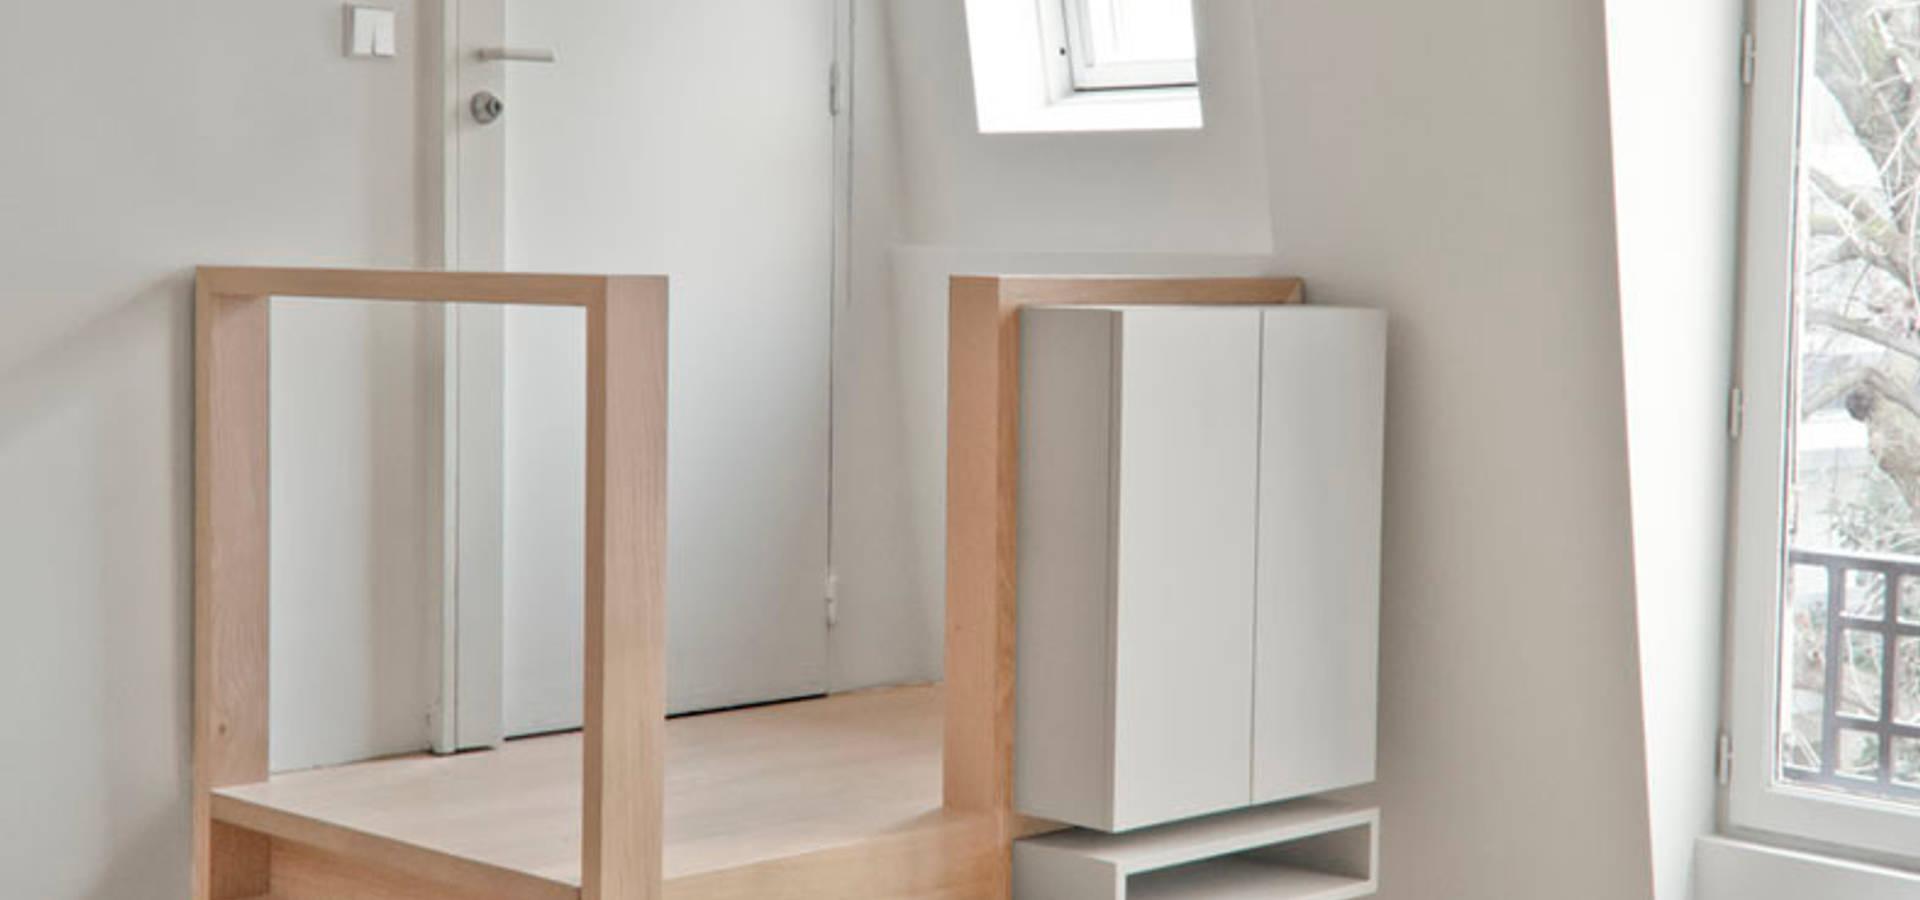 avenue de wagram de atelier sylvie cahen homify. Black Bedroom Furniture Sets. Home Design Ideas